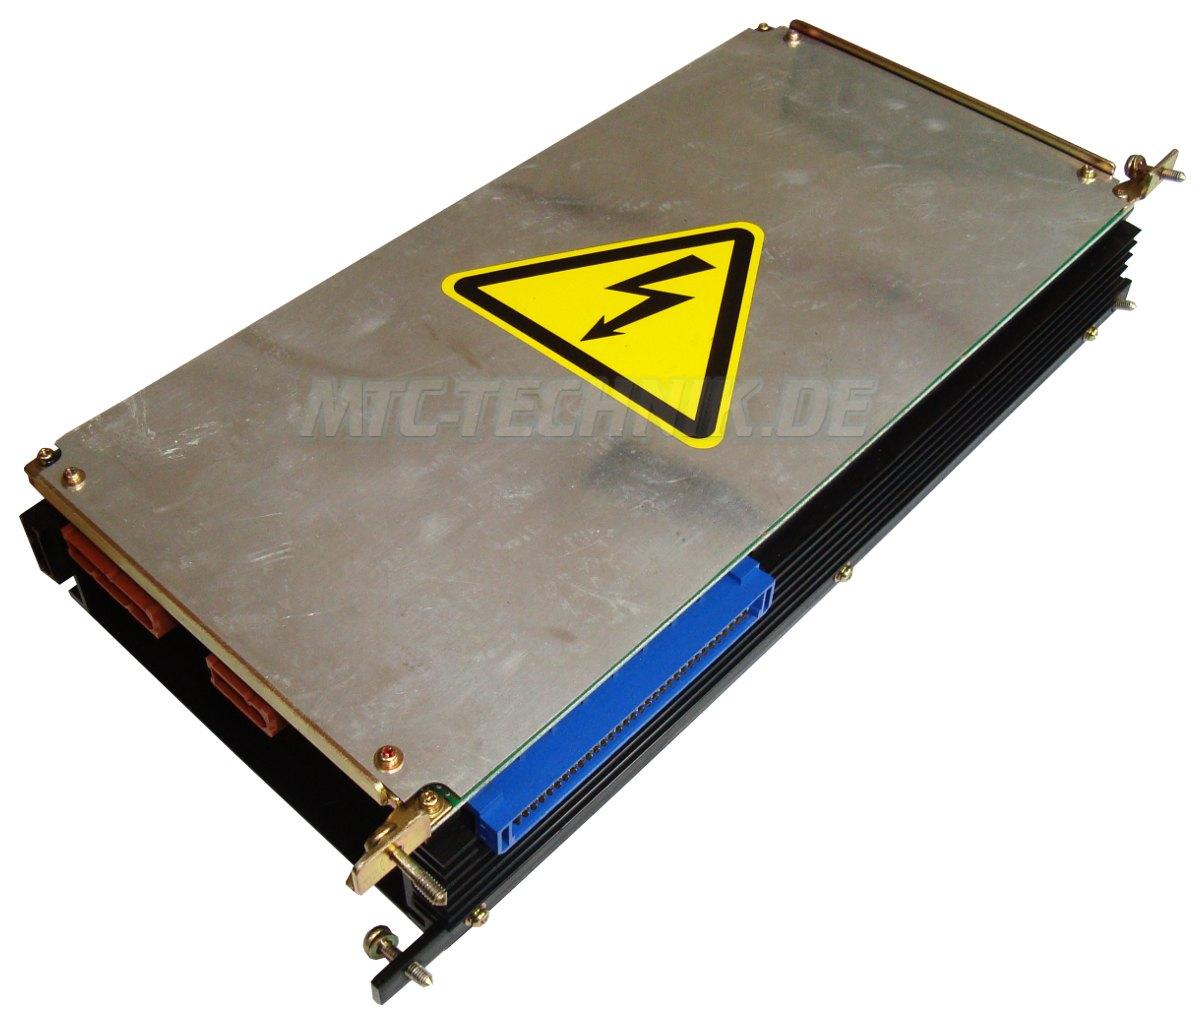 3 Exchange Fanuc A16b-1212-0100-01 Power Supply Unit